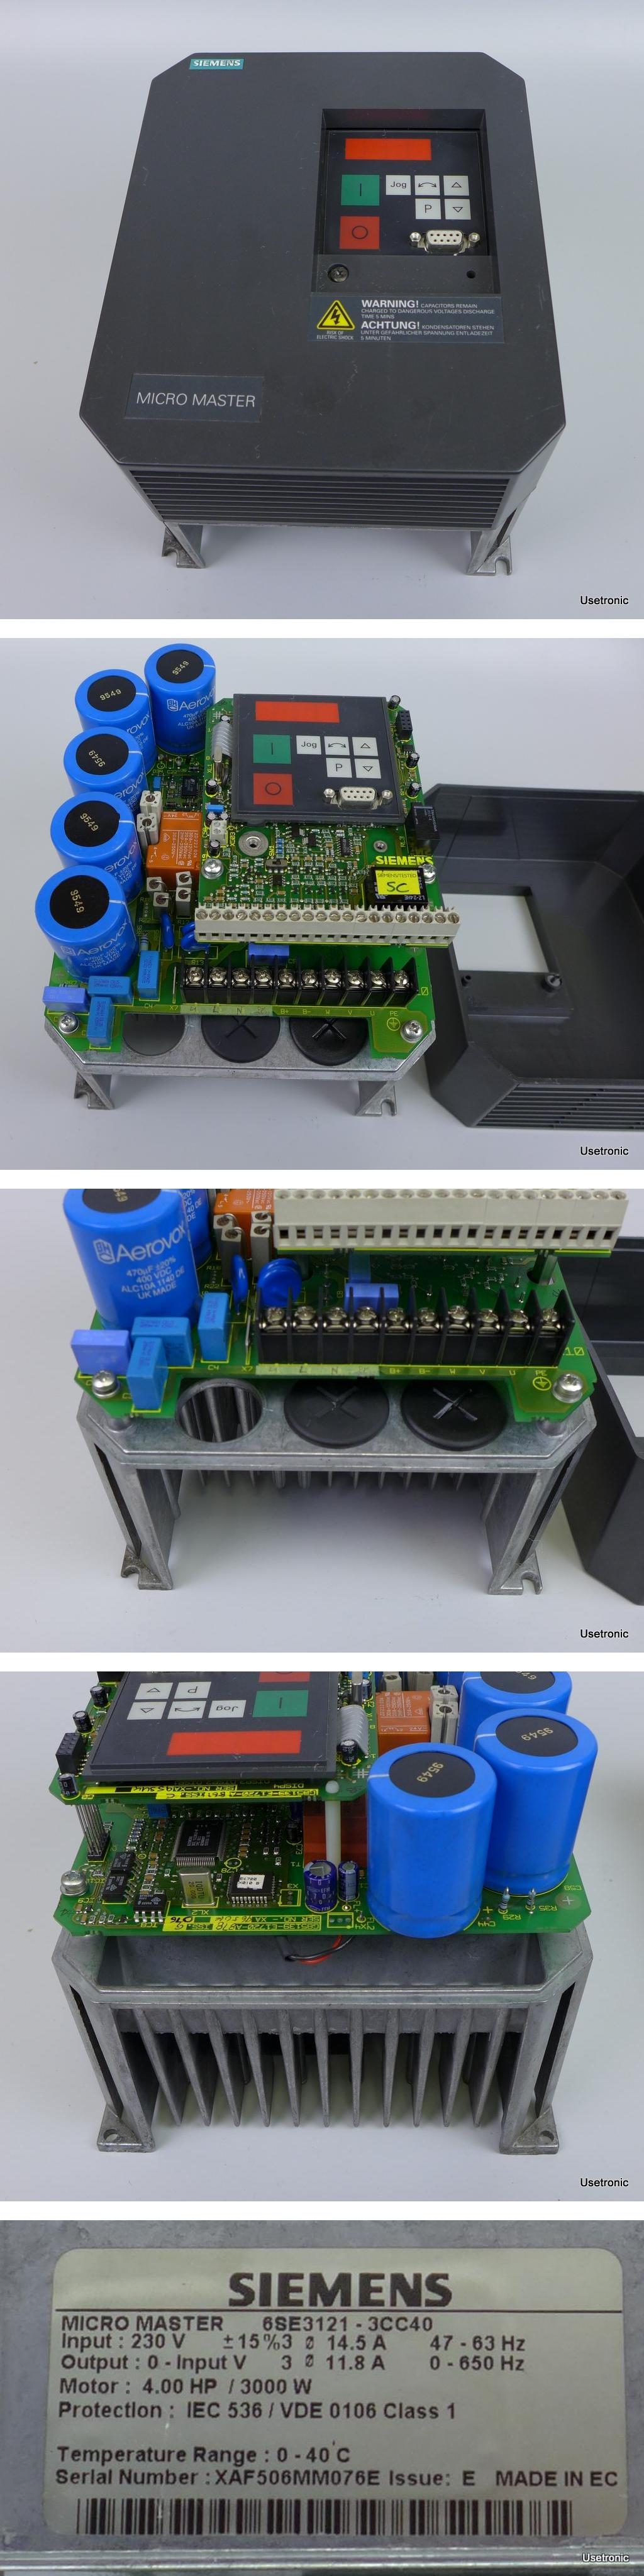 Siemens 6SE3121-3CC40